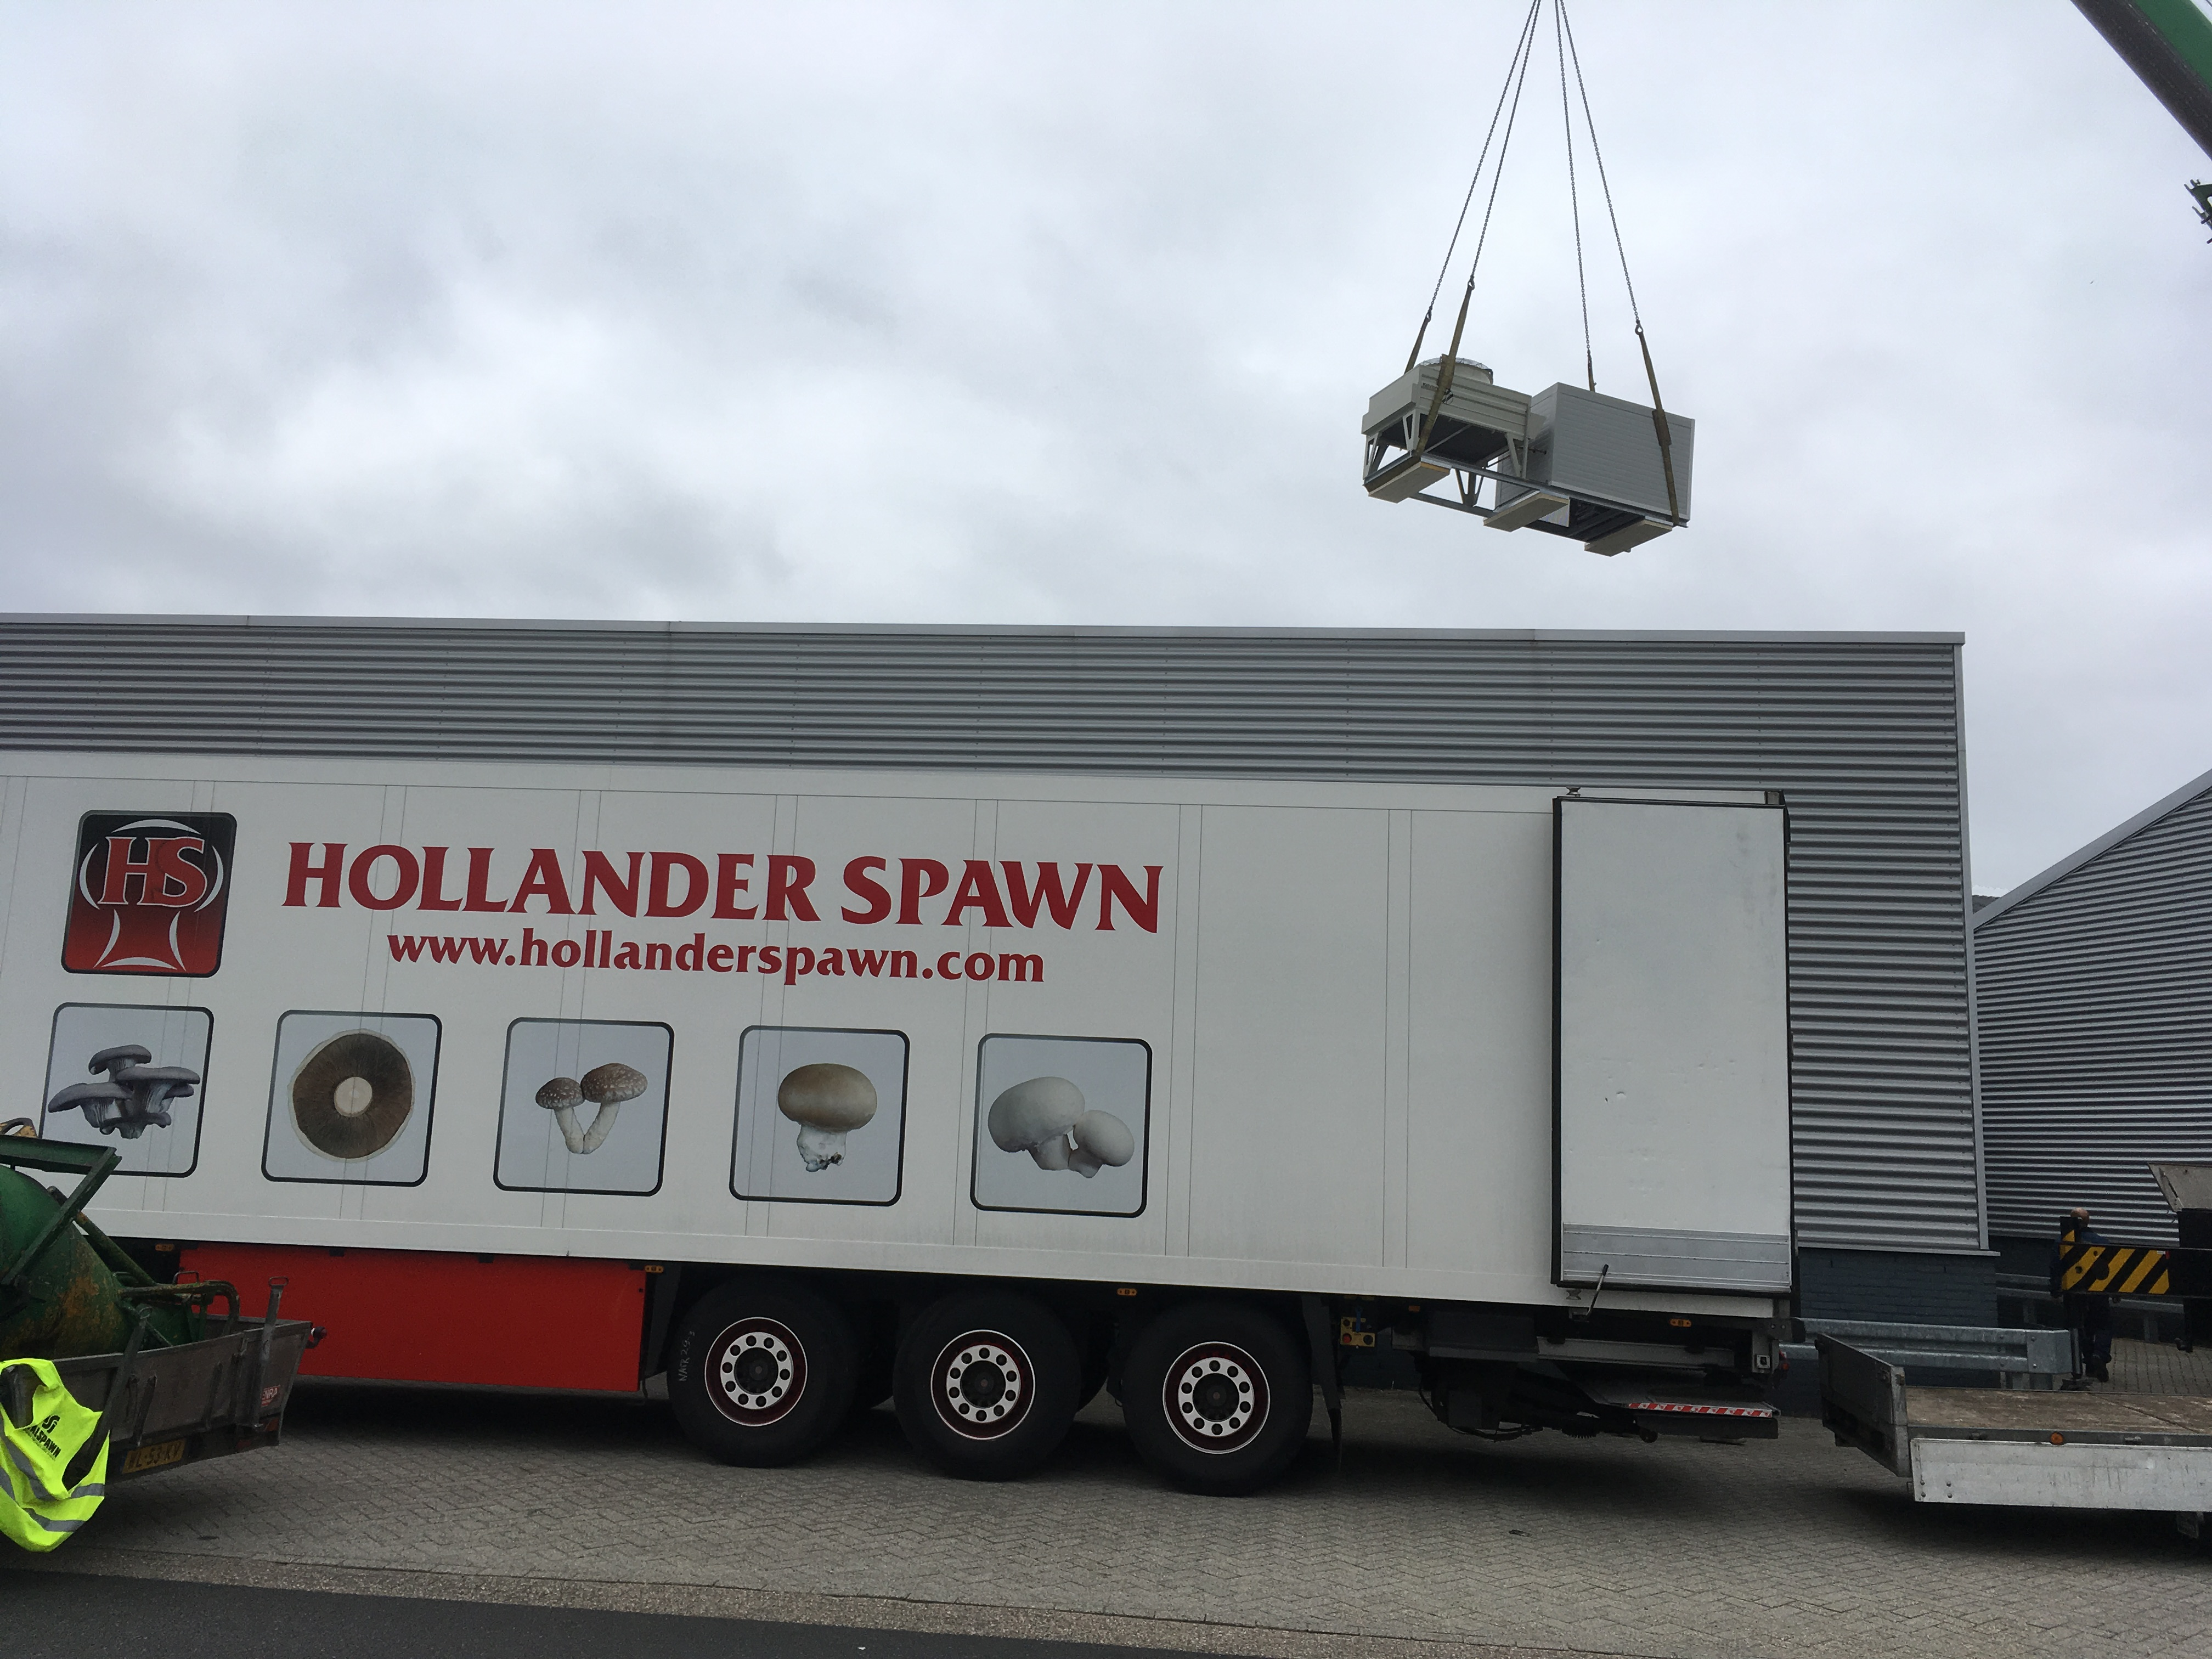 Hollander Spawn Goes Green